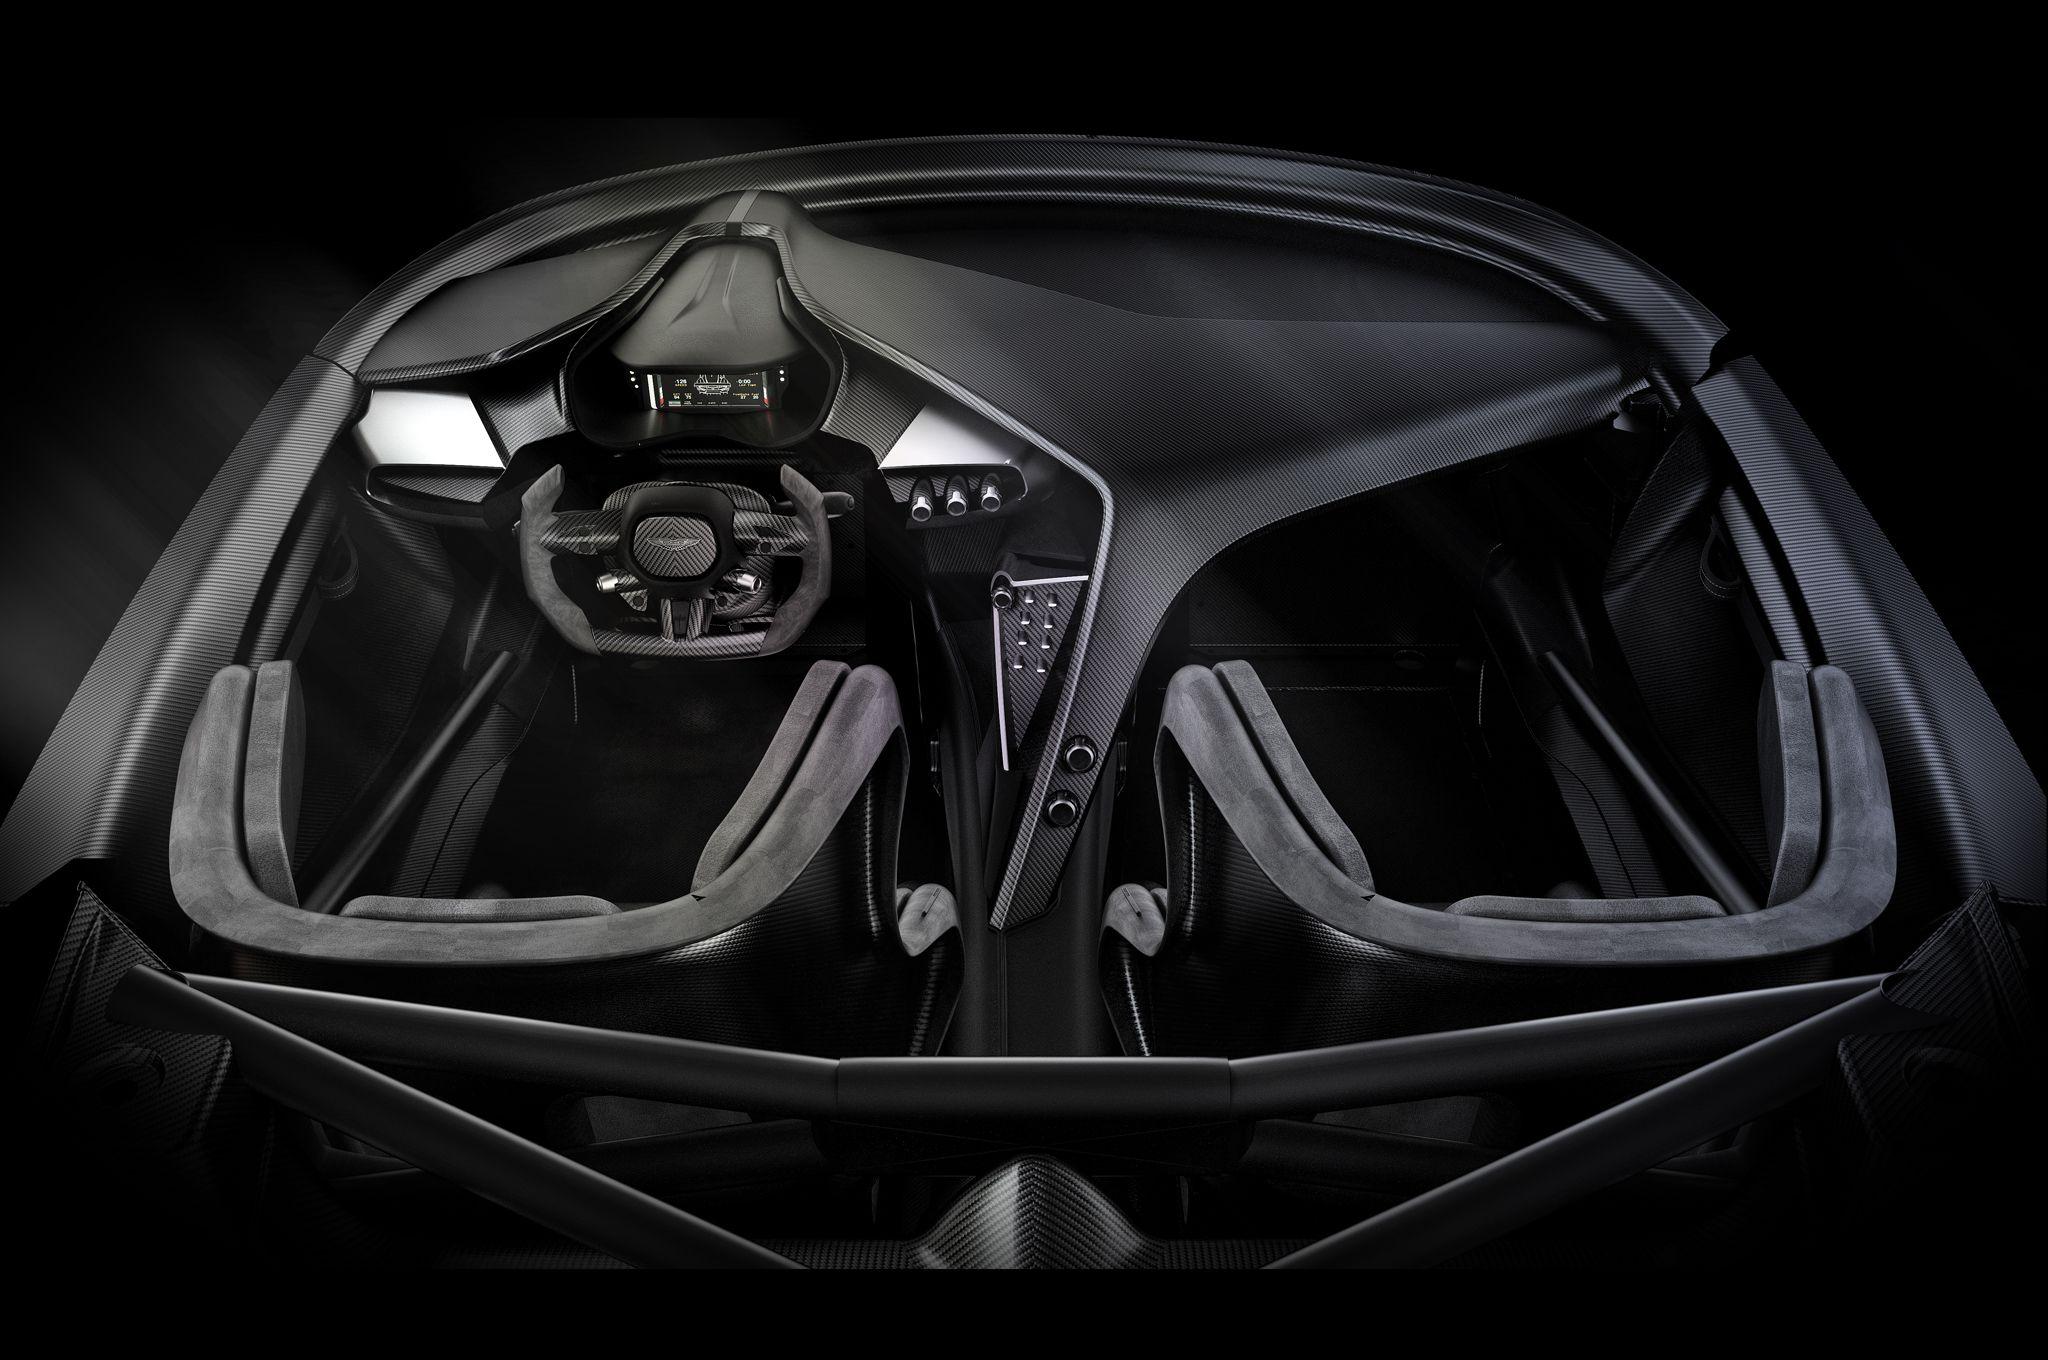 Aston Martin Vulcan First Look Aston Martin Vulcan Luxury Car Interior Aston Martin